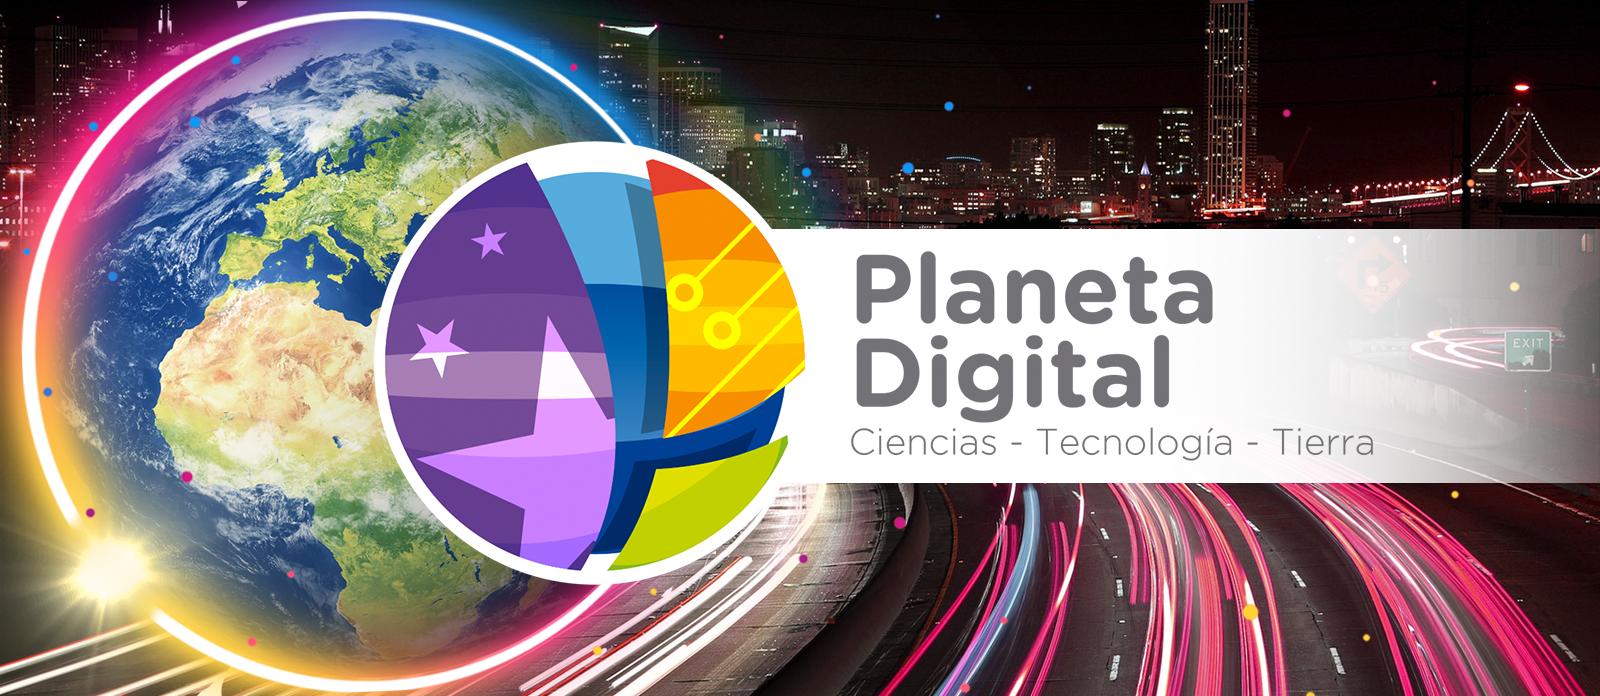 Planeta Digital Banner